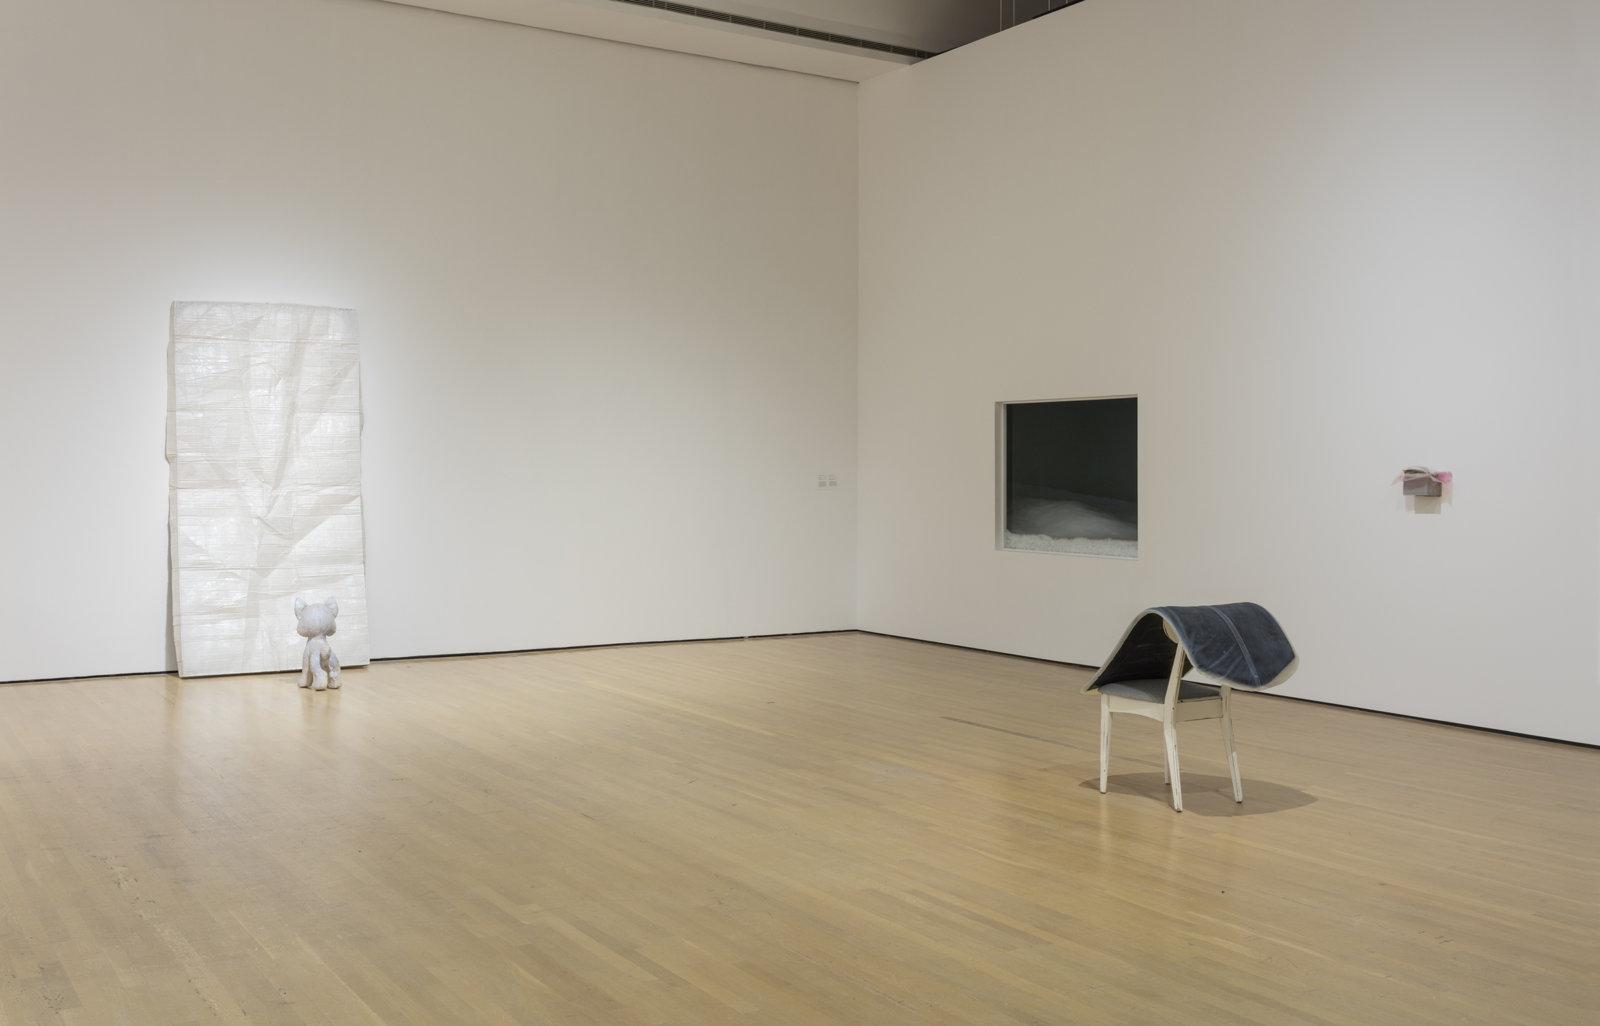 Liz Magor, installation view, Habitude, Musée d'art contemporain de Montréal, 2016 by Liz Magor